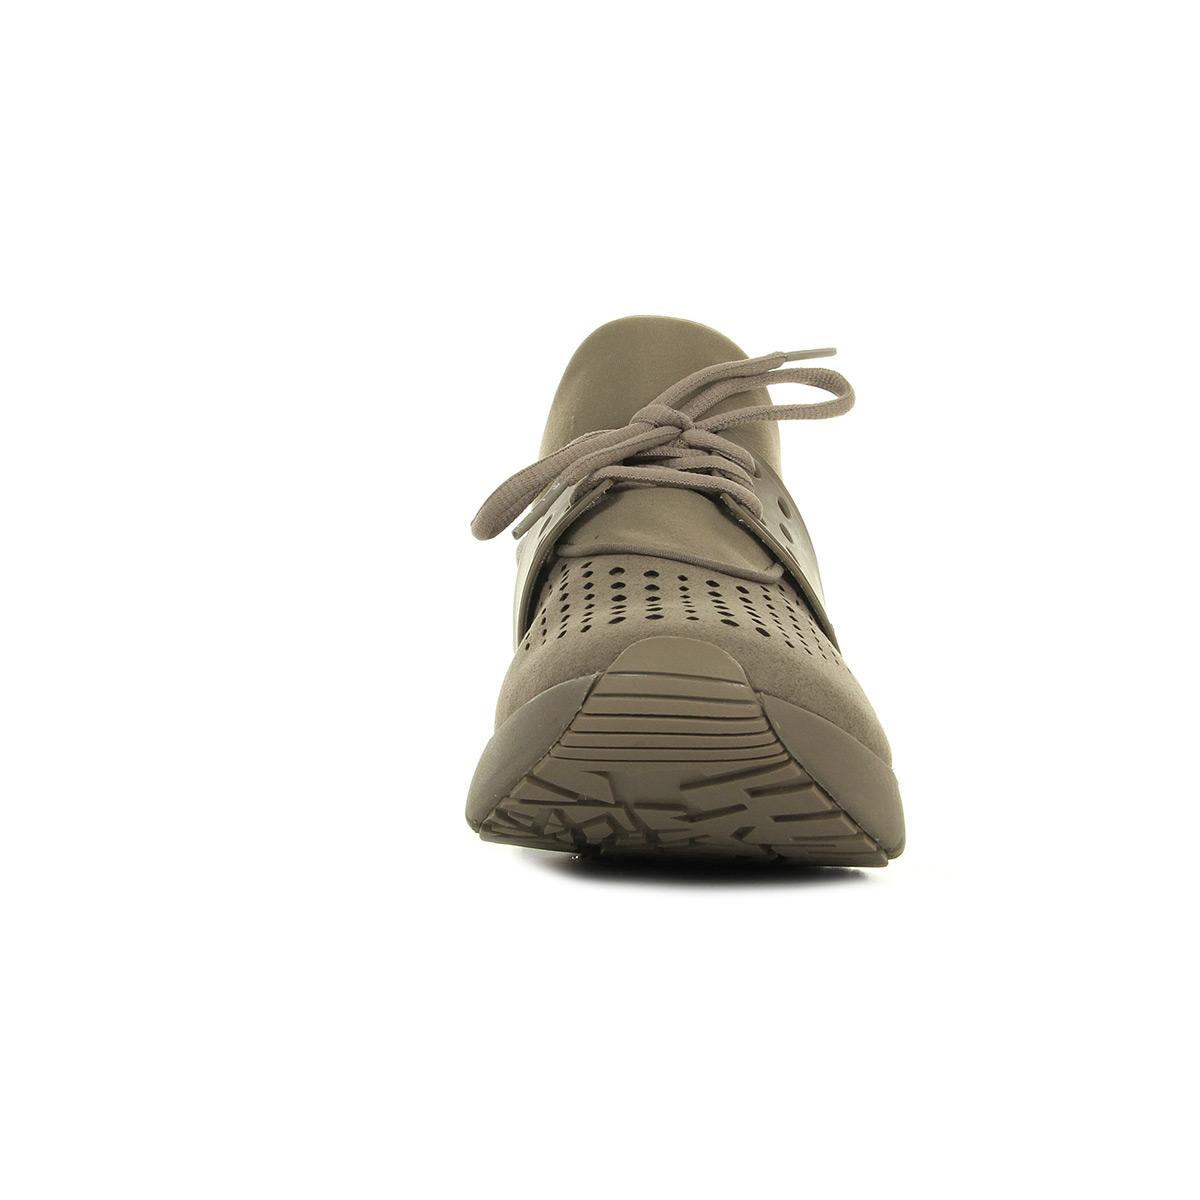 Timberland Kiri Up Microfiber Taupe Grey CA1MJV, Baskets mode femme